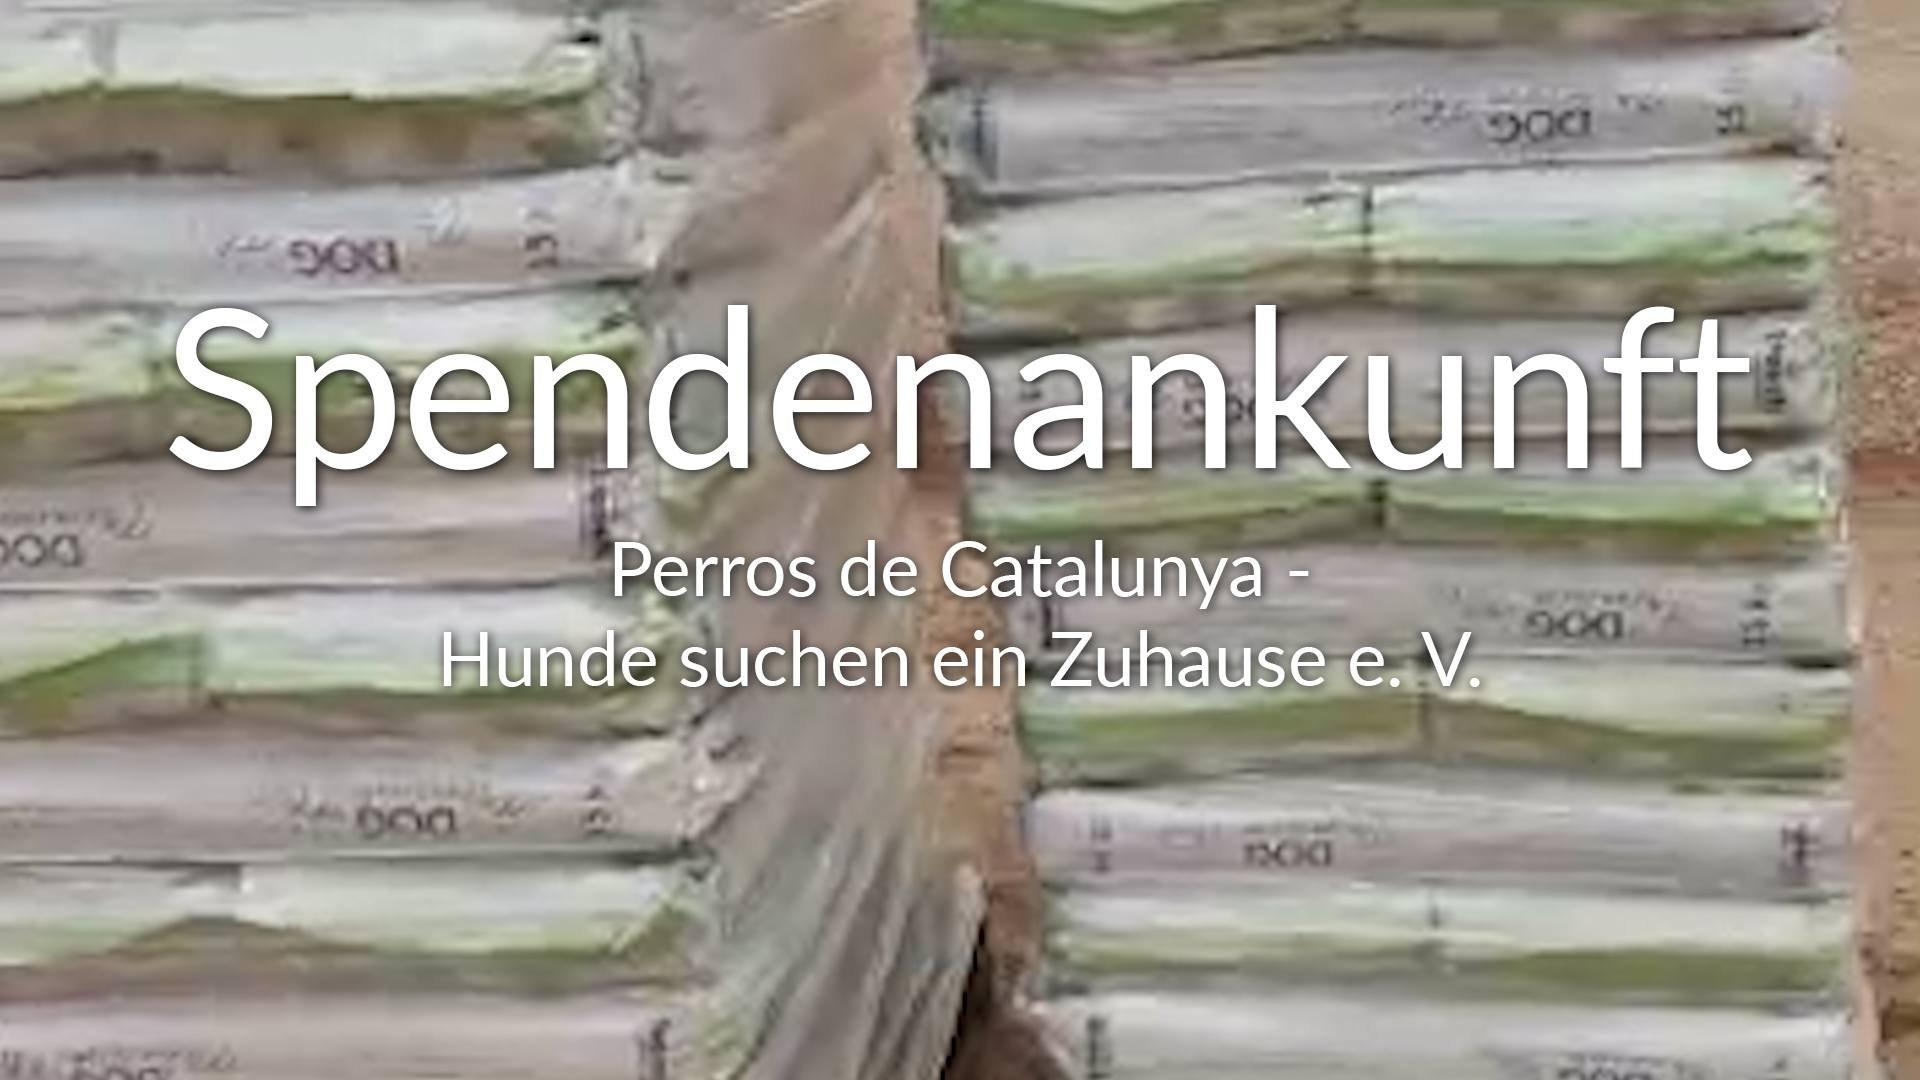 Perros de Catalunya - Hunde suchen ein Zuhause e. V.